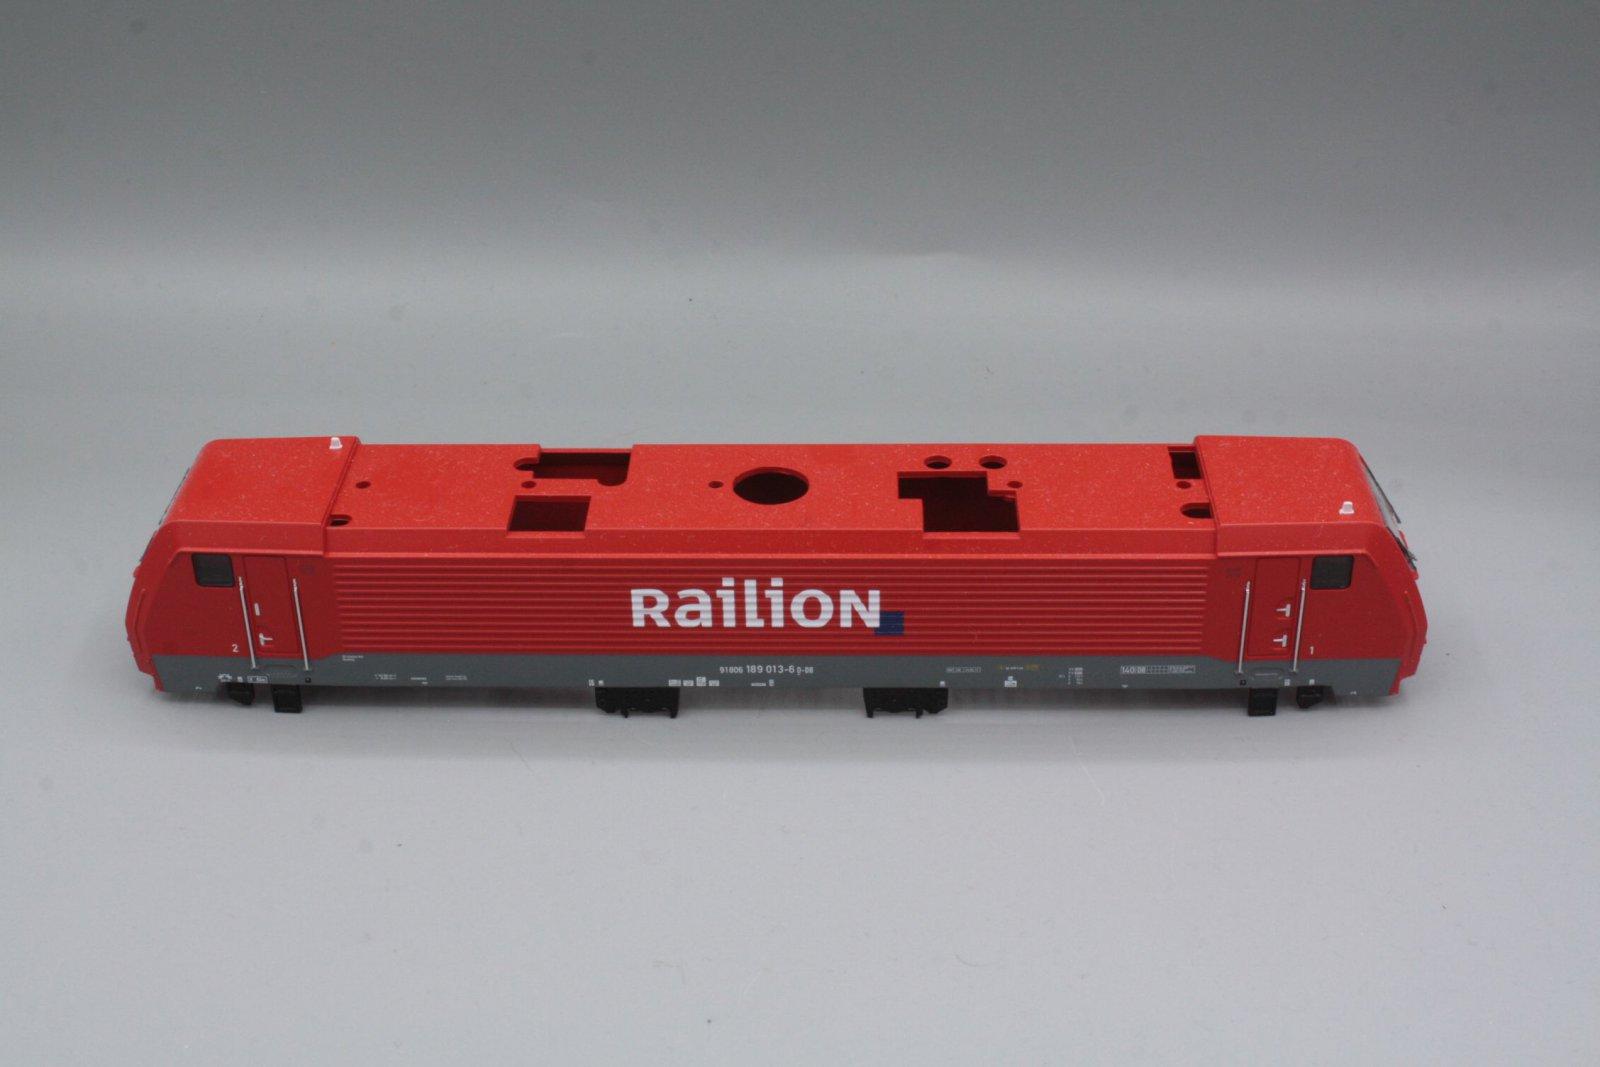 Ersatzteil Piko 189 013-6 Gehäuse Railion verkehrsrot